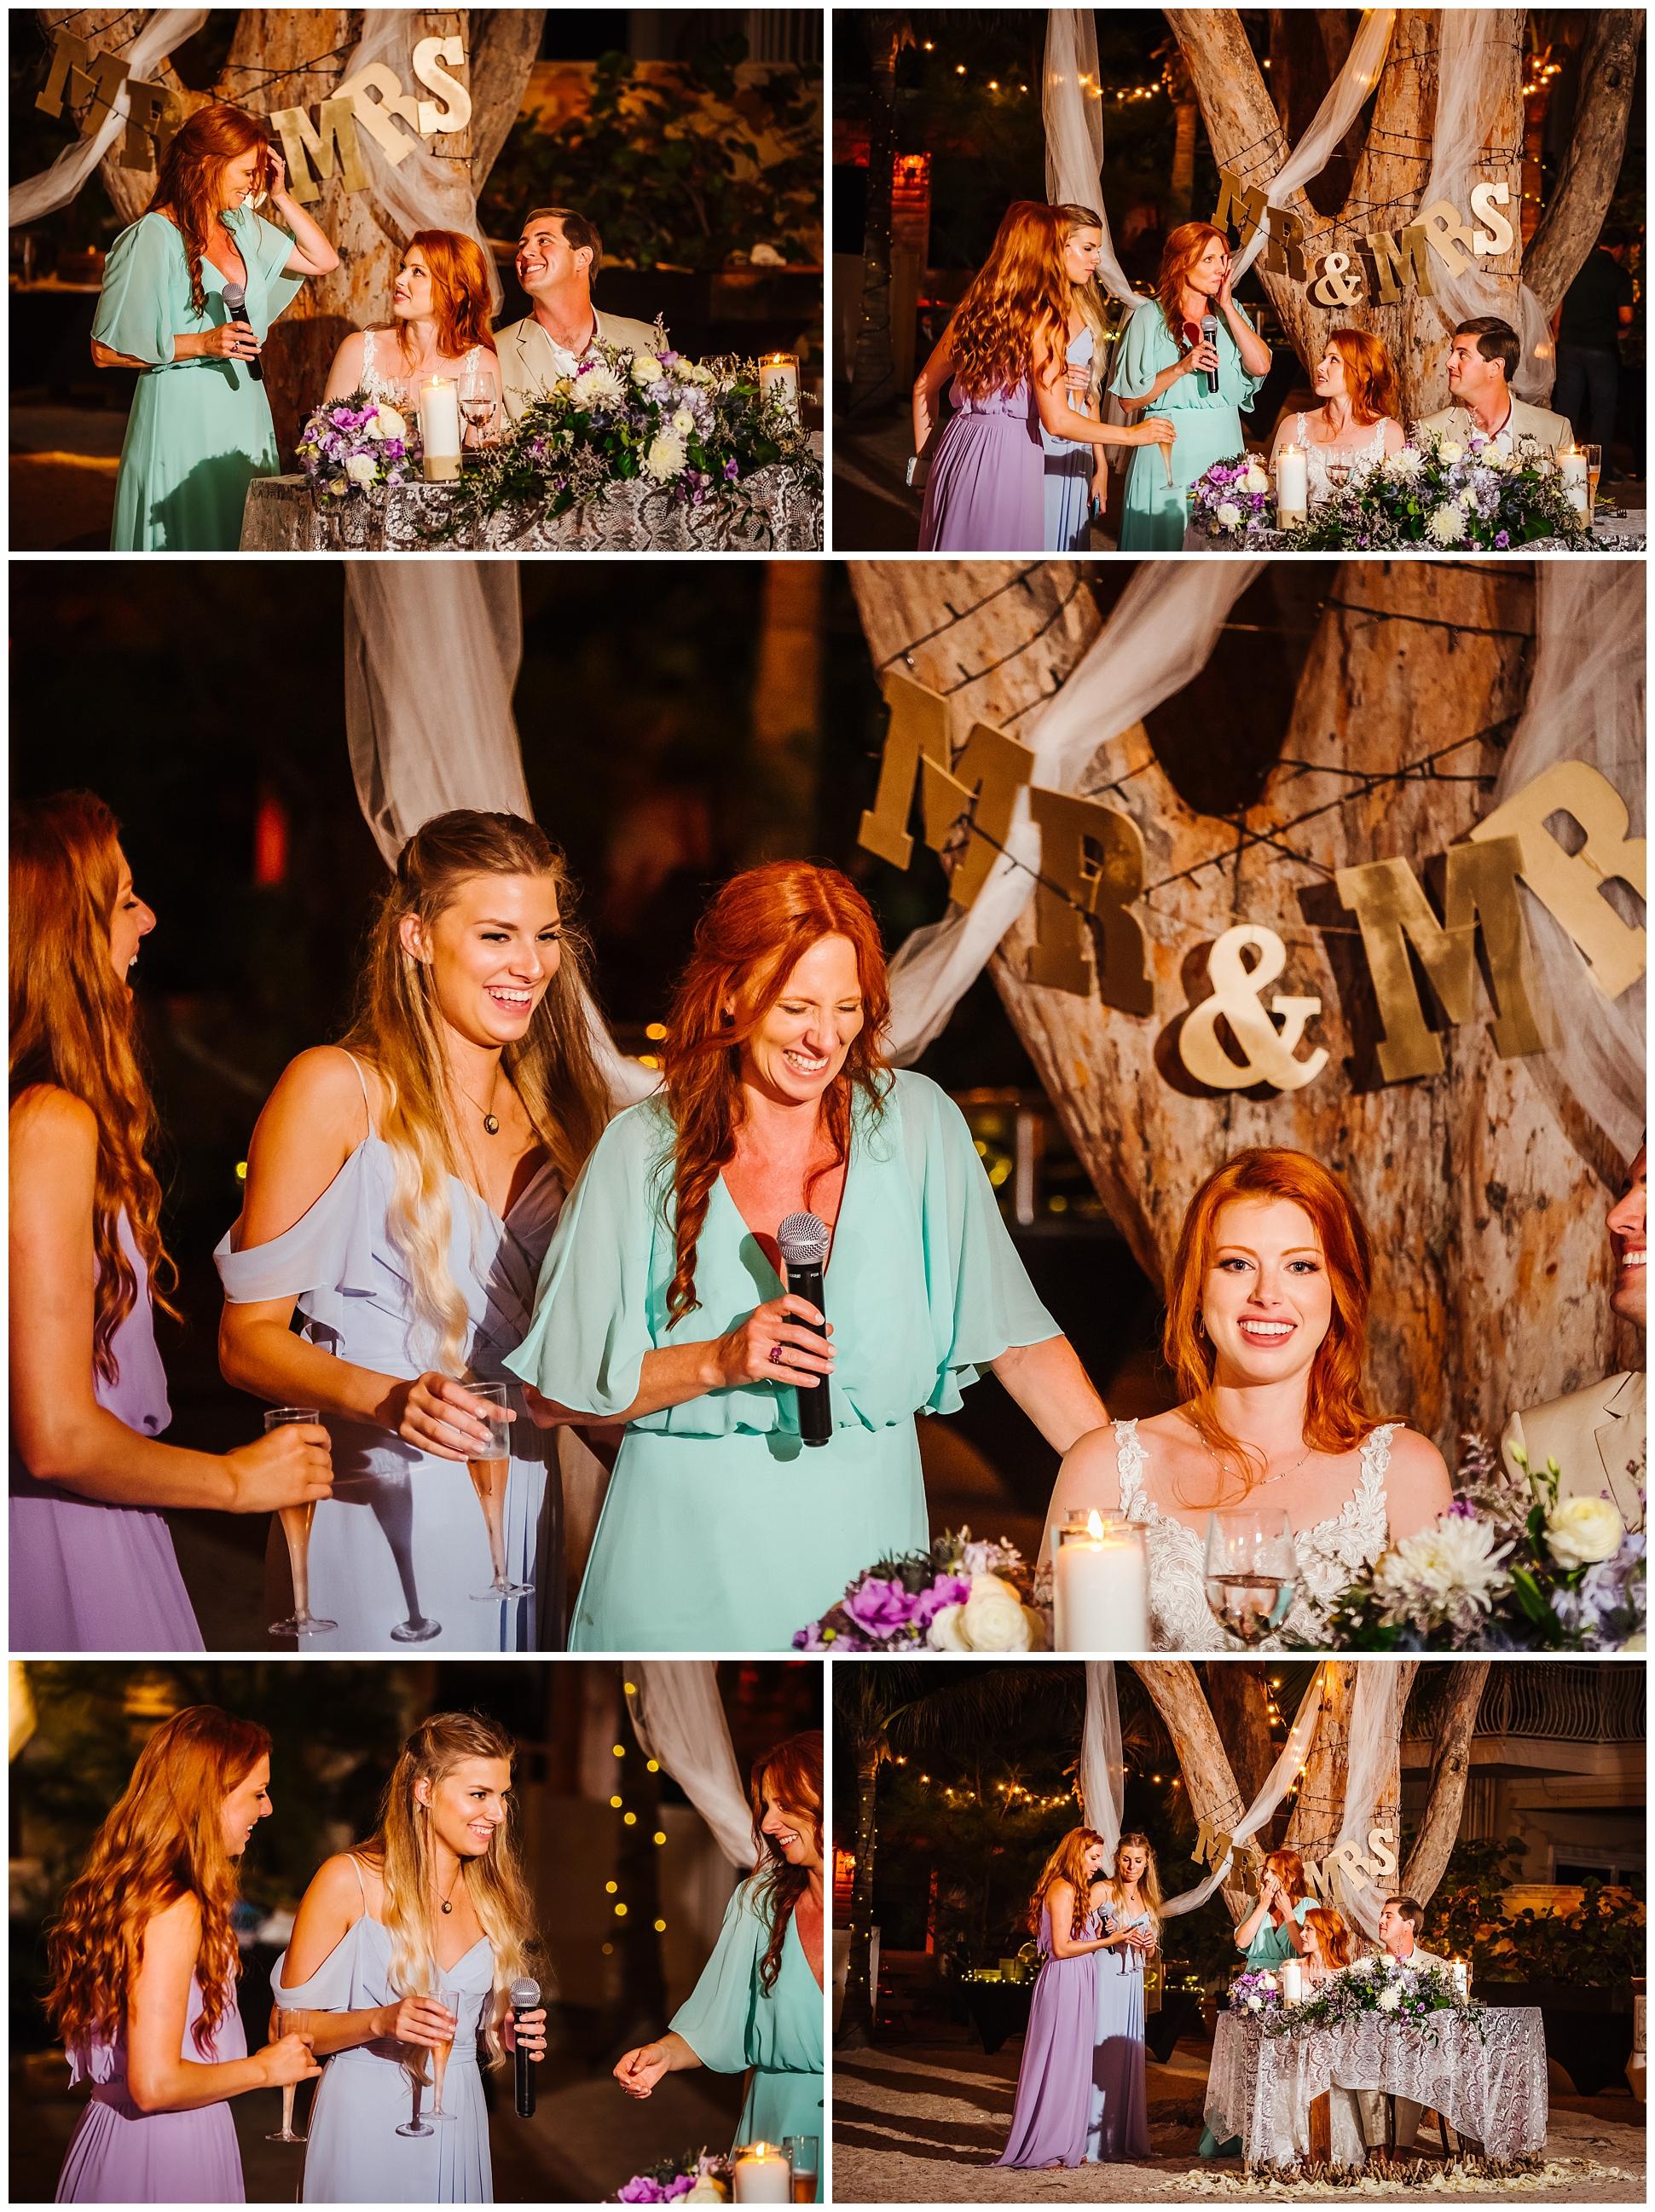 tampa-st-pete-wedding-photographer-indian-rocks-beach-mermaid-train-redhead_0174.jpg